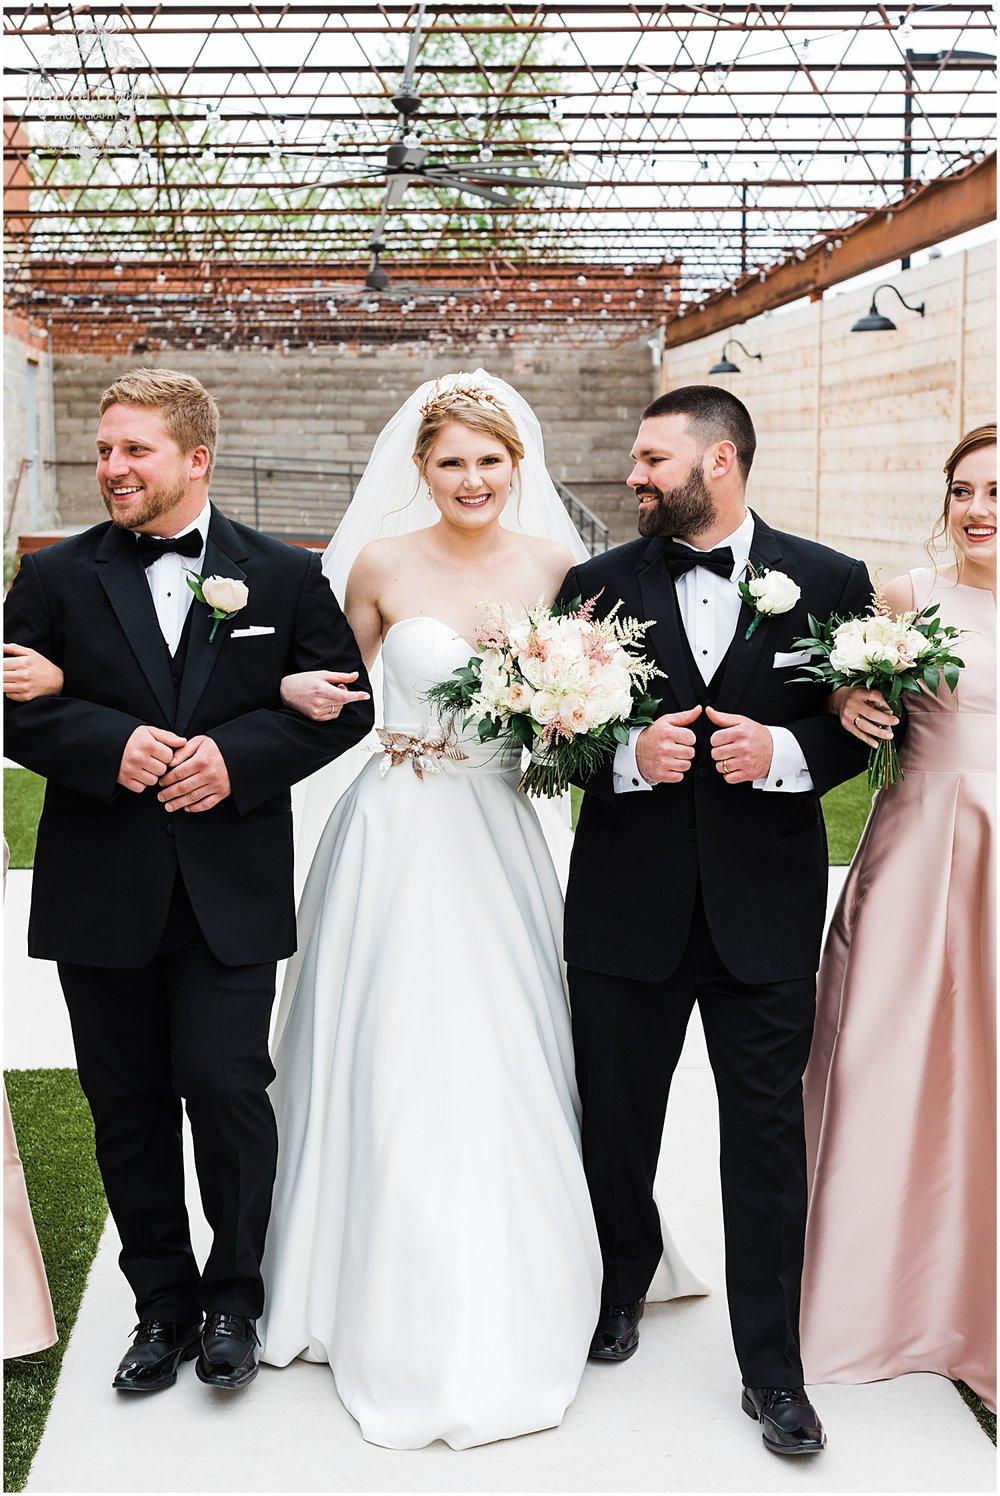 ABBY & CHARLIE WEDDING   THE HUDSON EVENT SPACE WEDDING   MARISSA CRIBBS PHOTOGRAPHY_7524.jpg